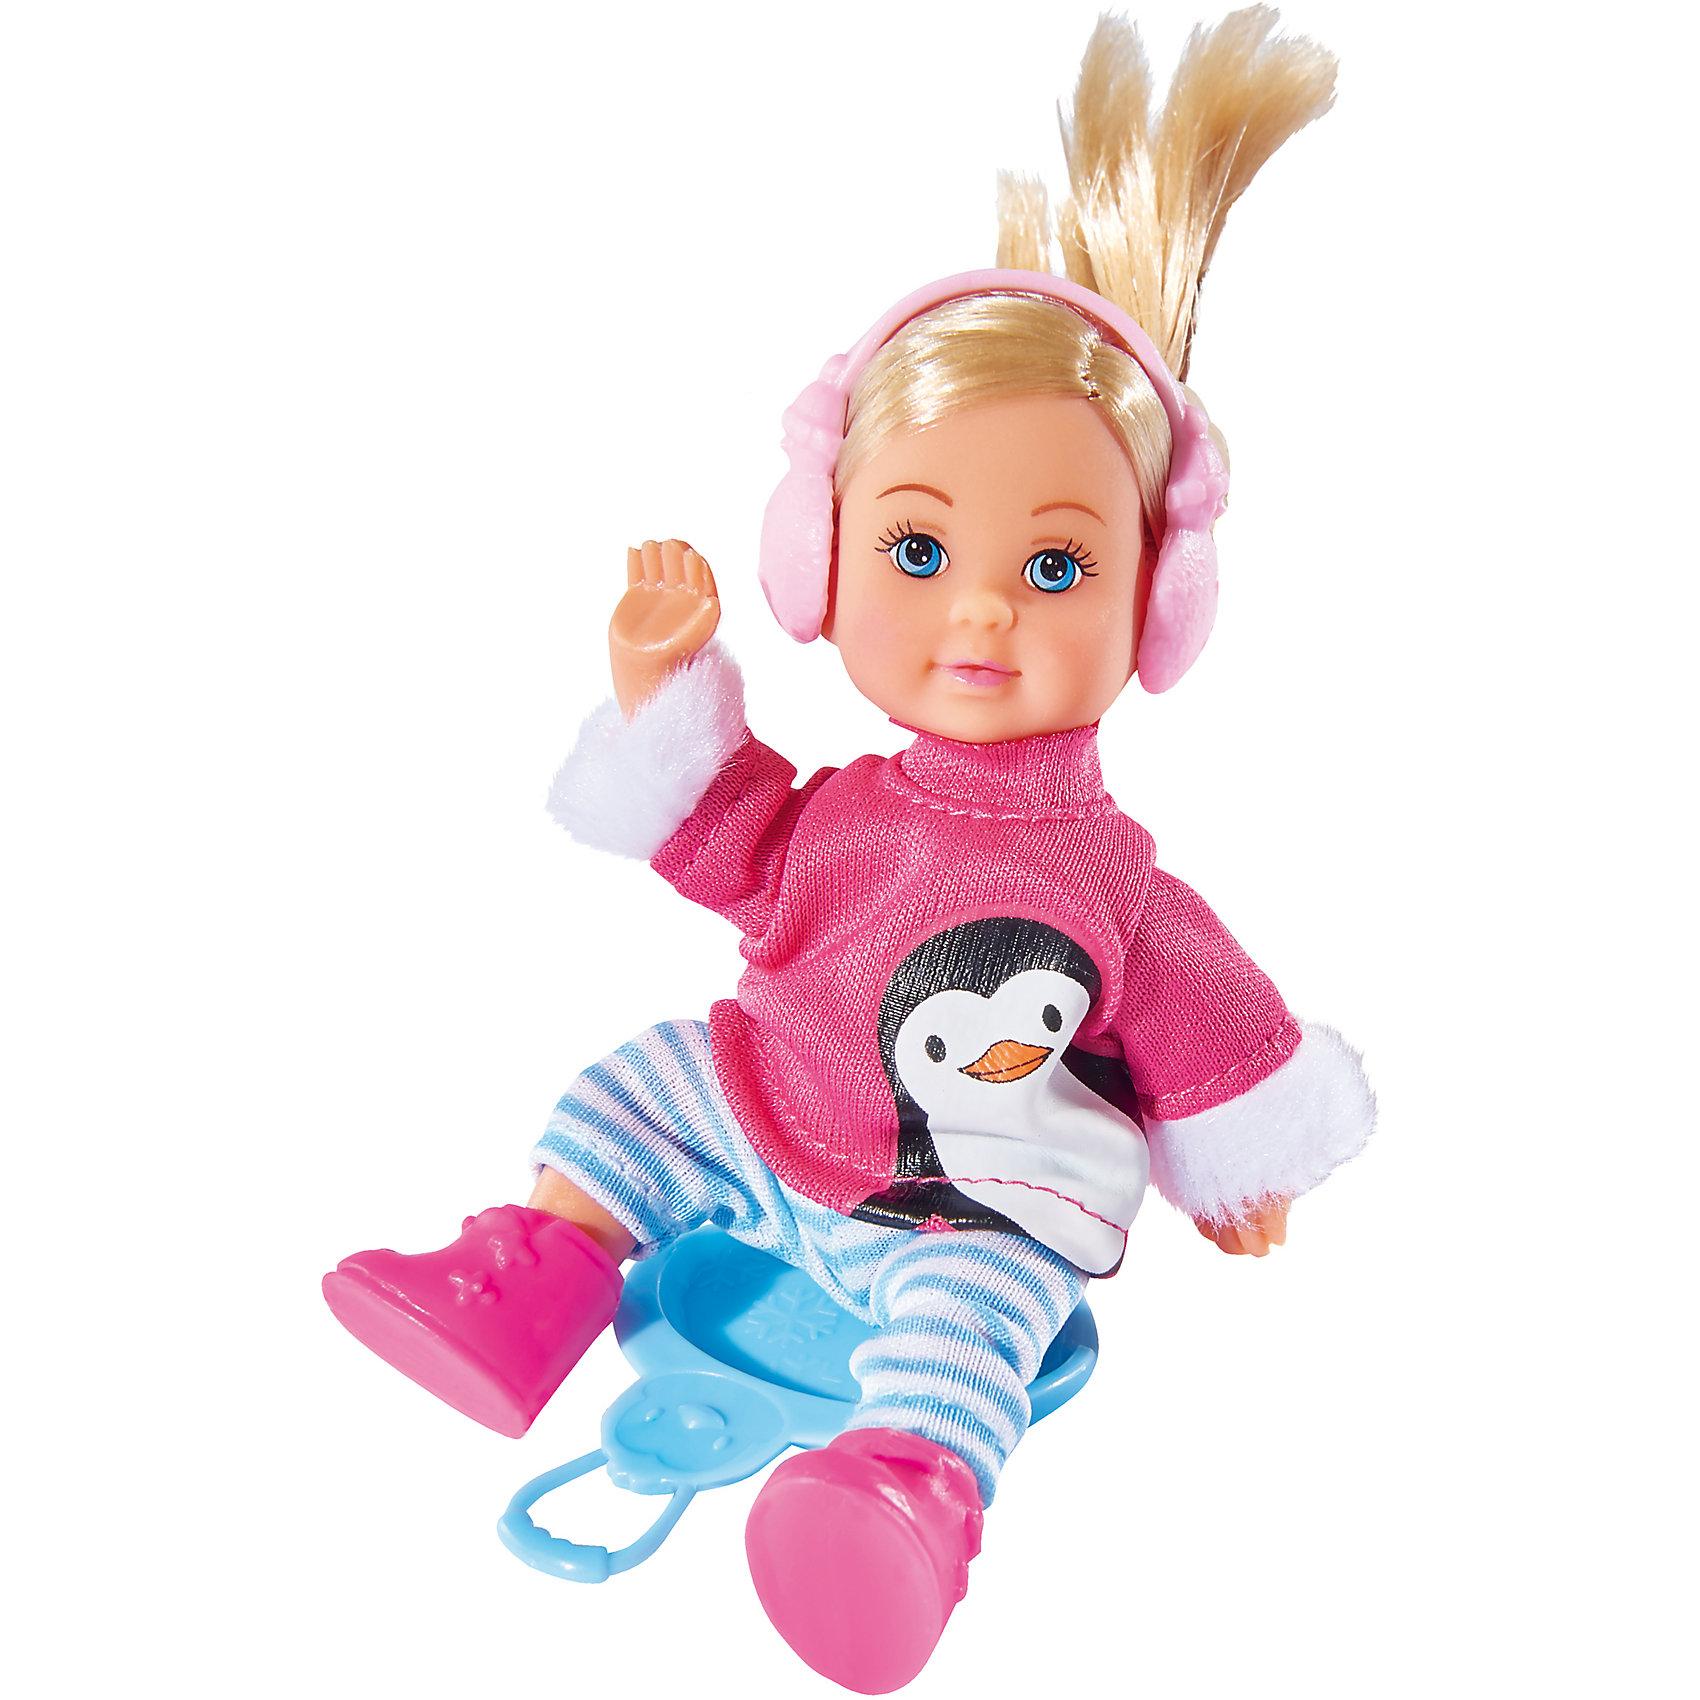 simba кукла еви с подружкой Simba Кукла Еви в зимнем костюме,12 см, Simba